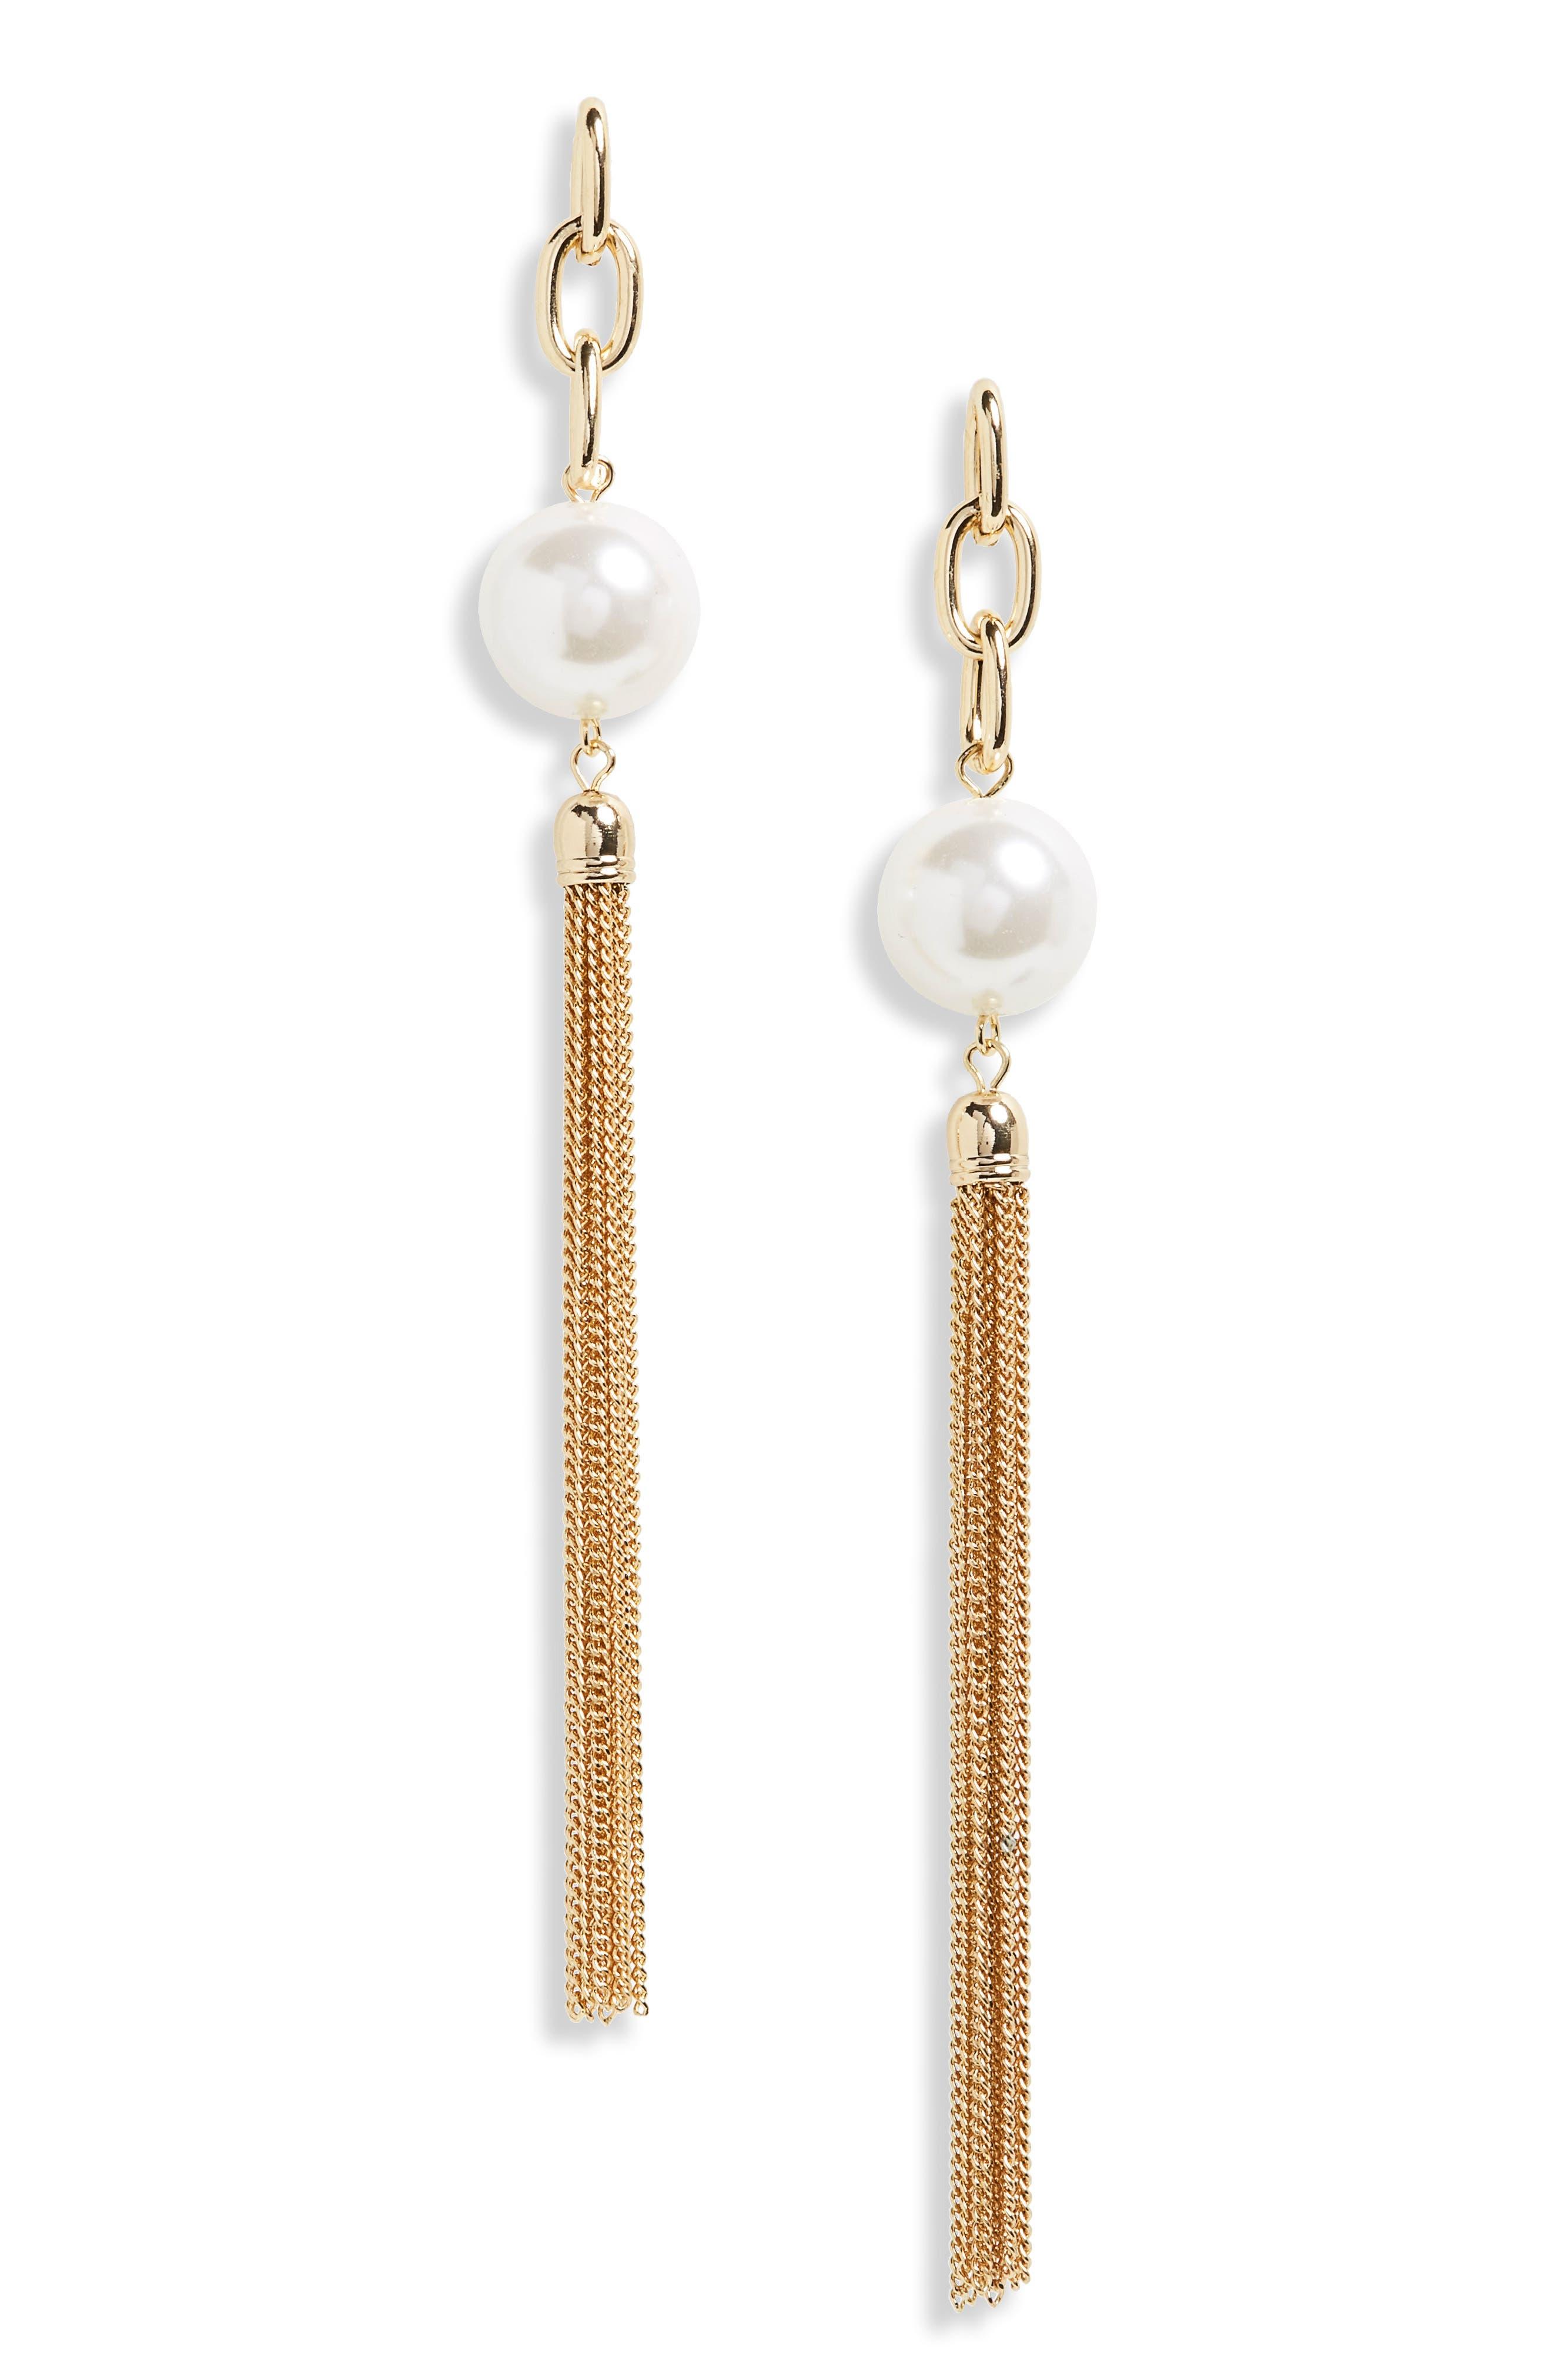 Alternate Image 1 Selected - BP. Imitation Pearl Fringe Earrings